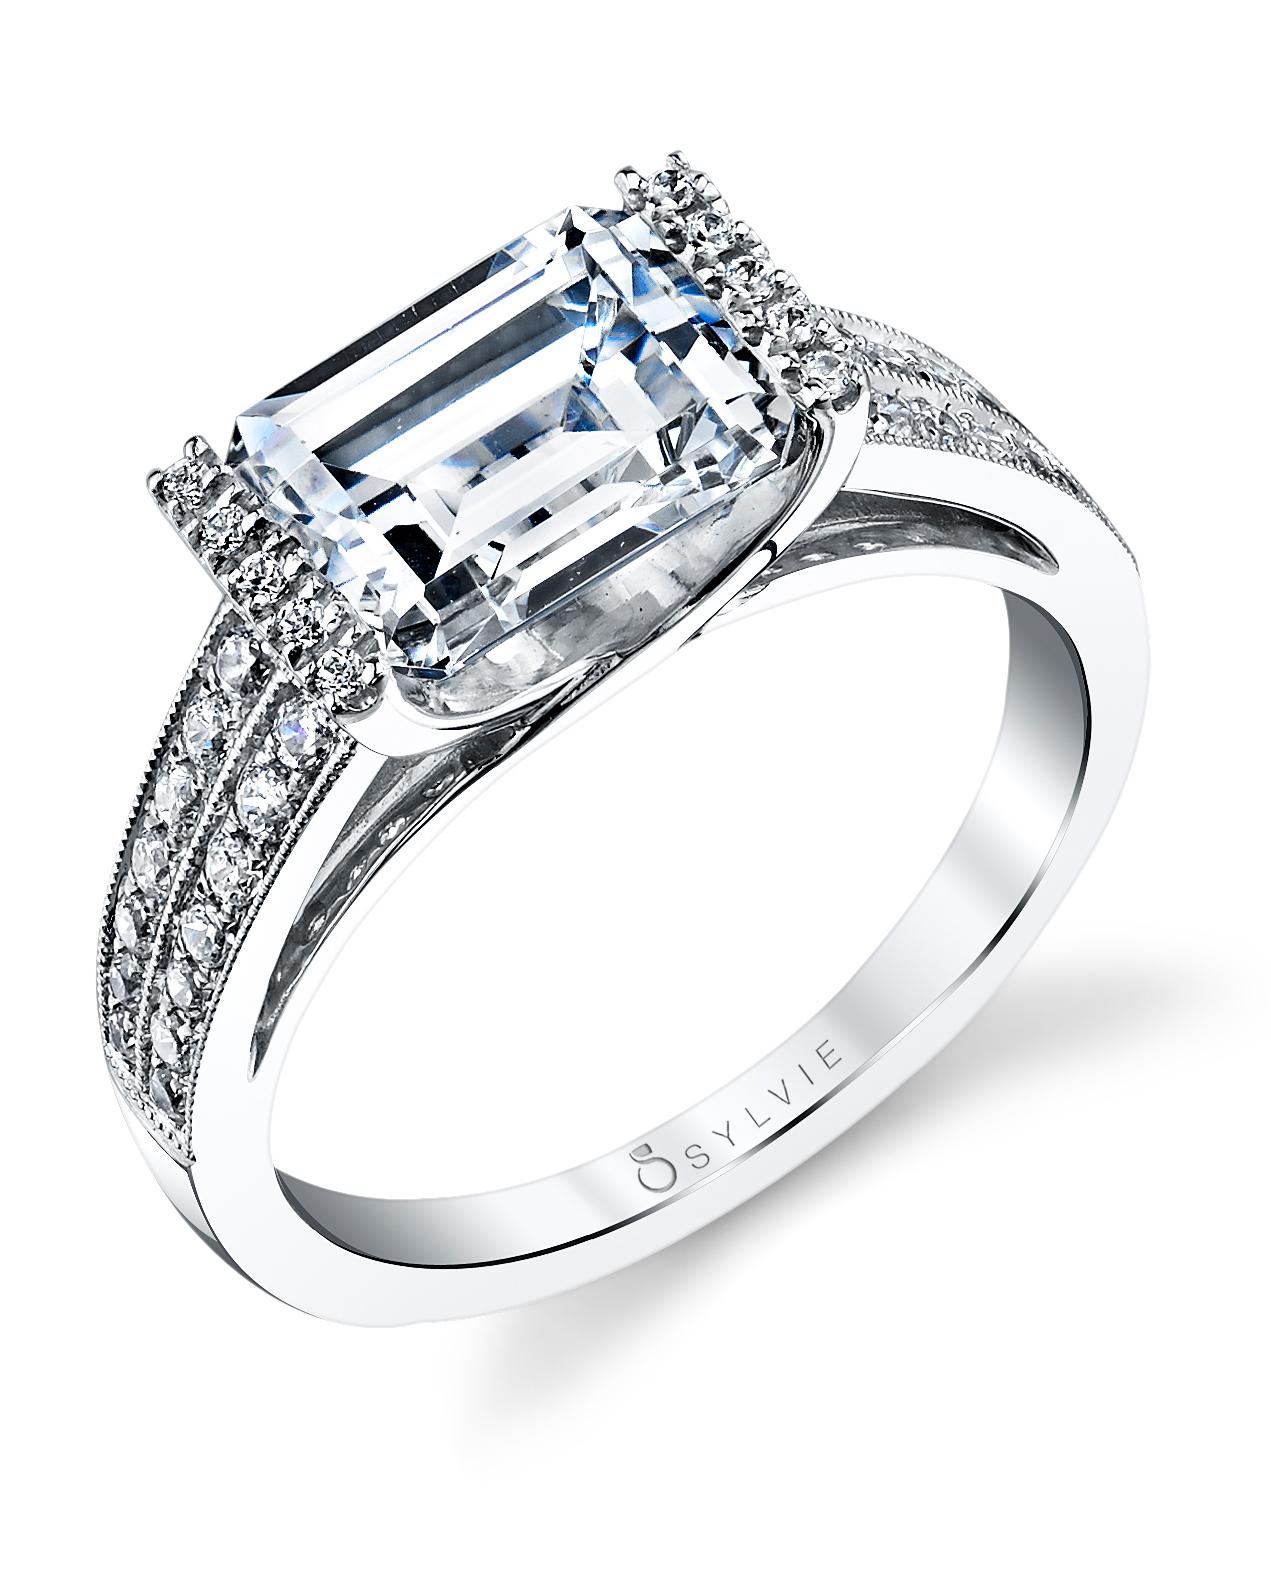 sylvie-emerald-cut-engagement-ring-one-0816.jpg